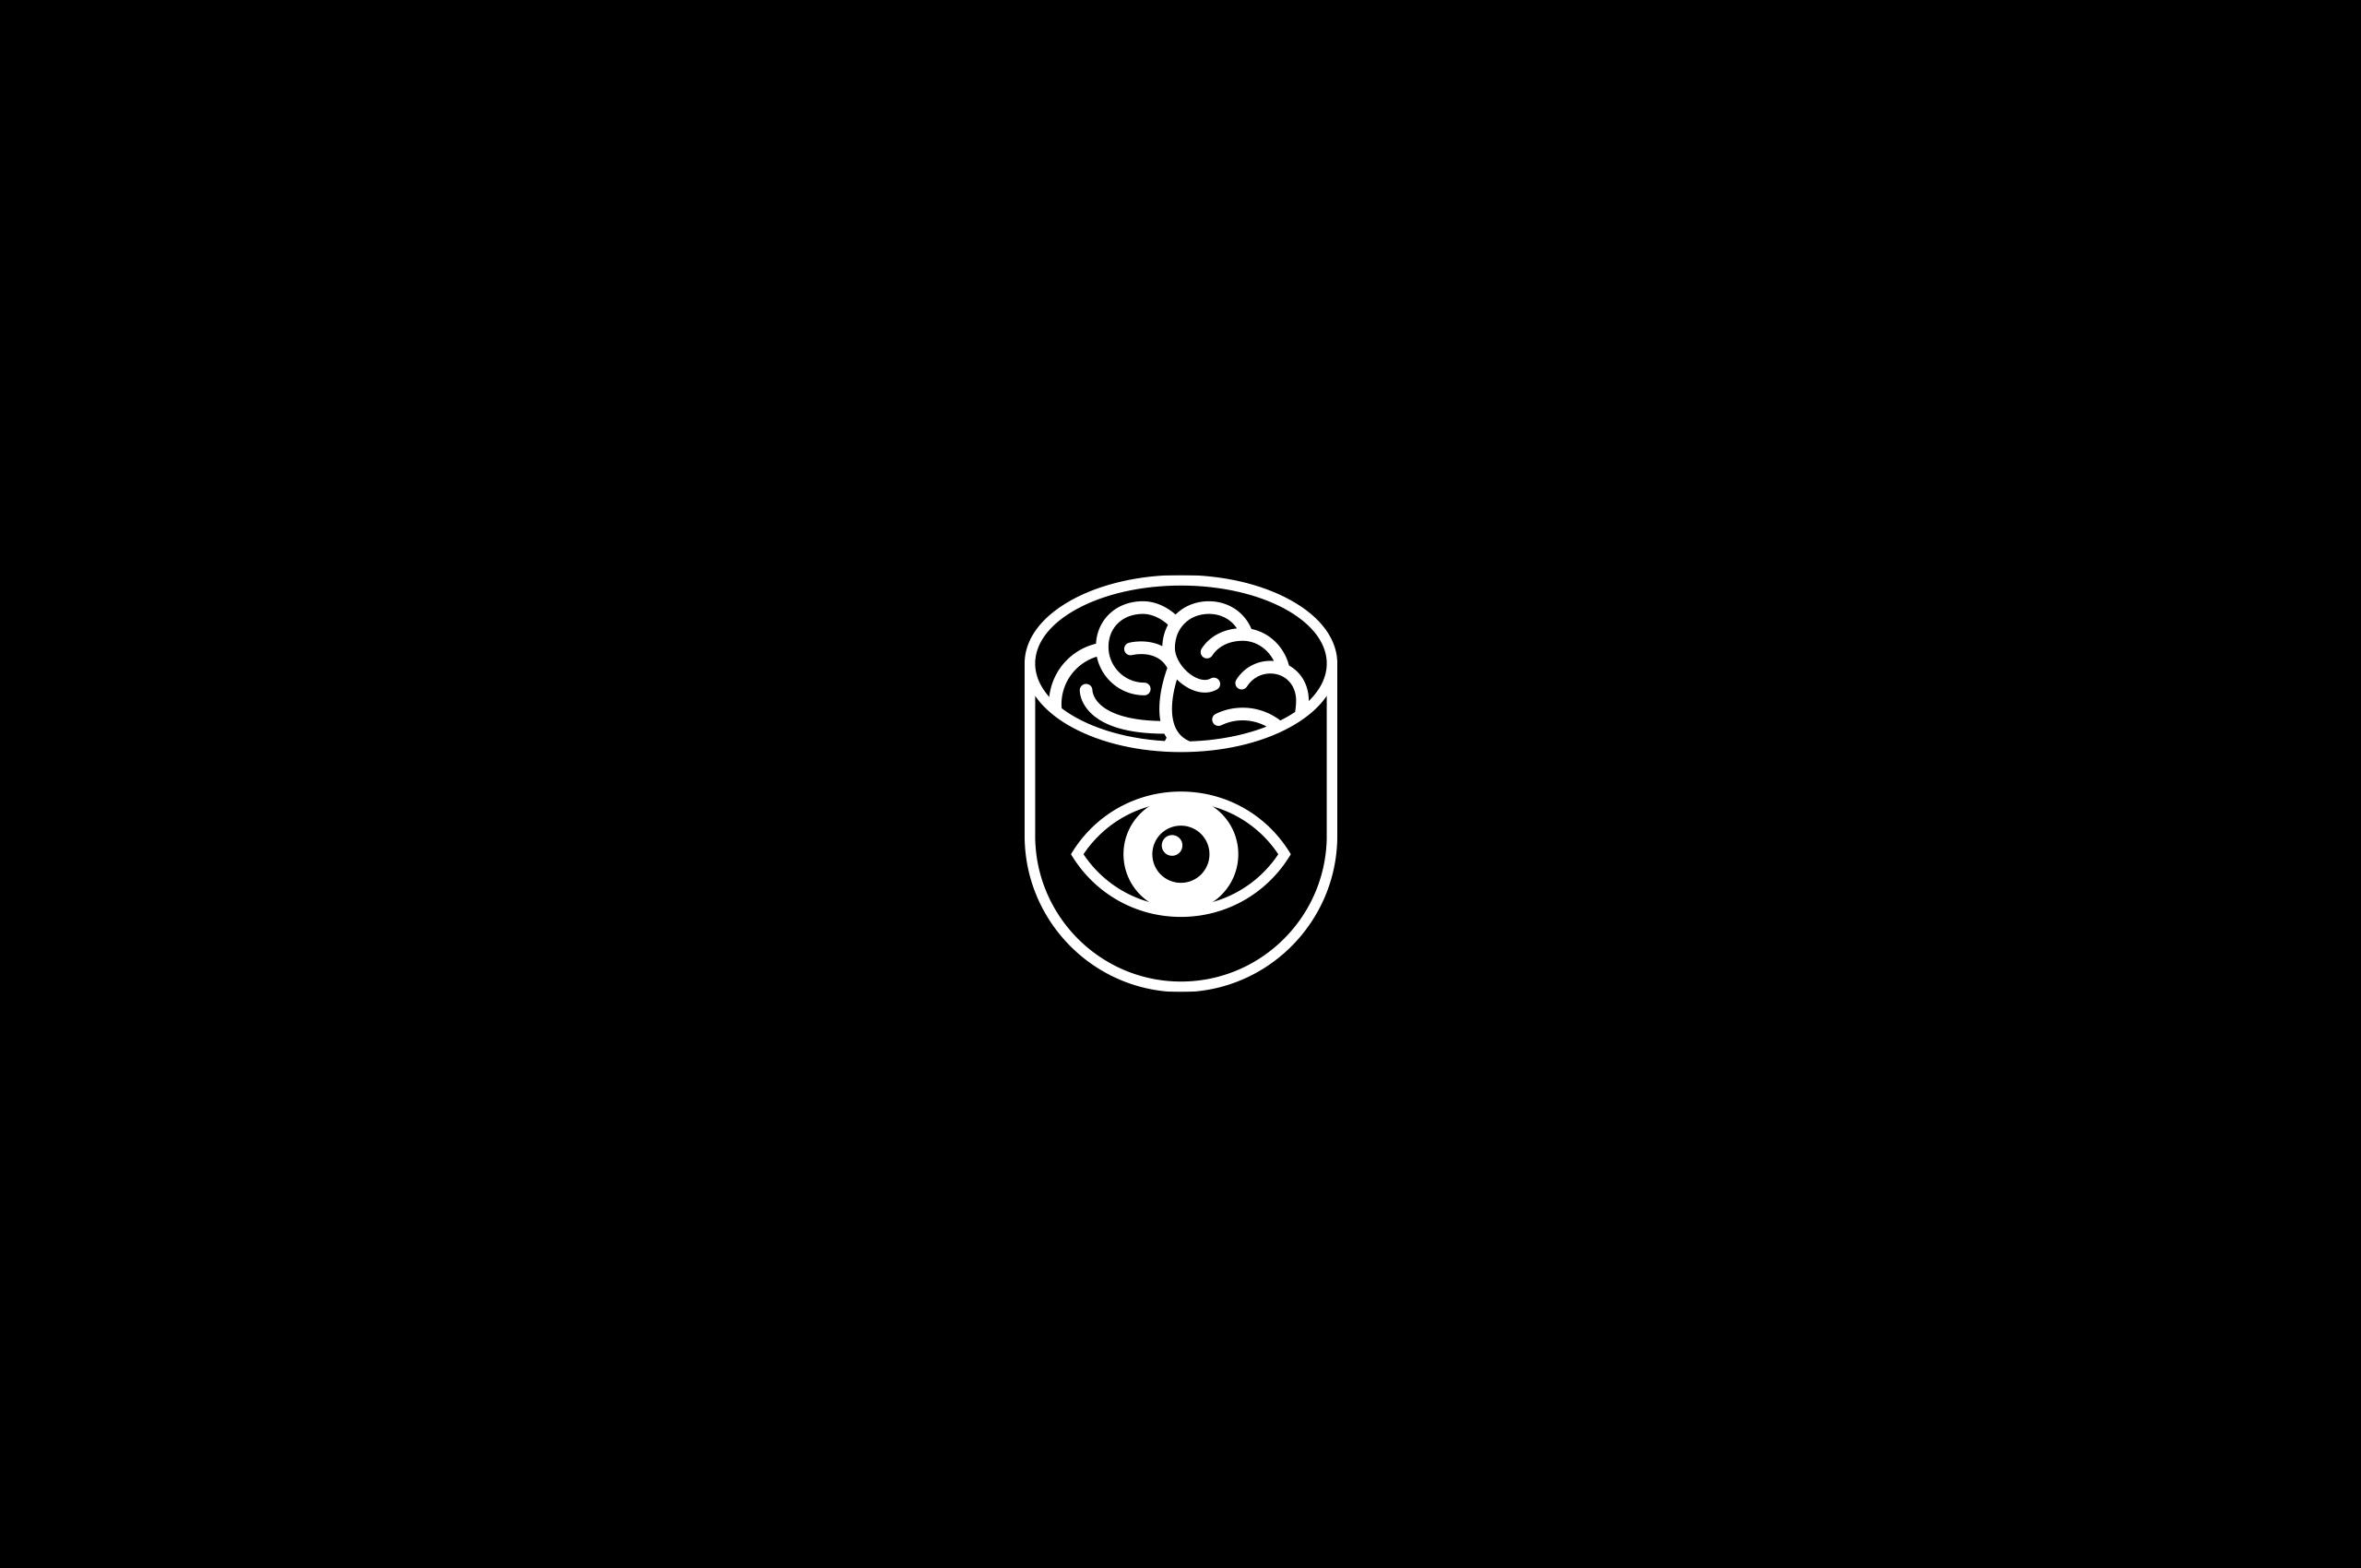 logo-3-black